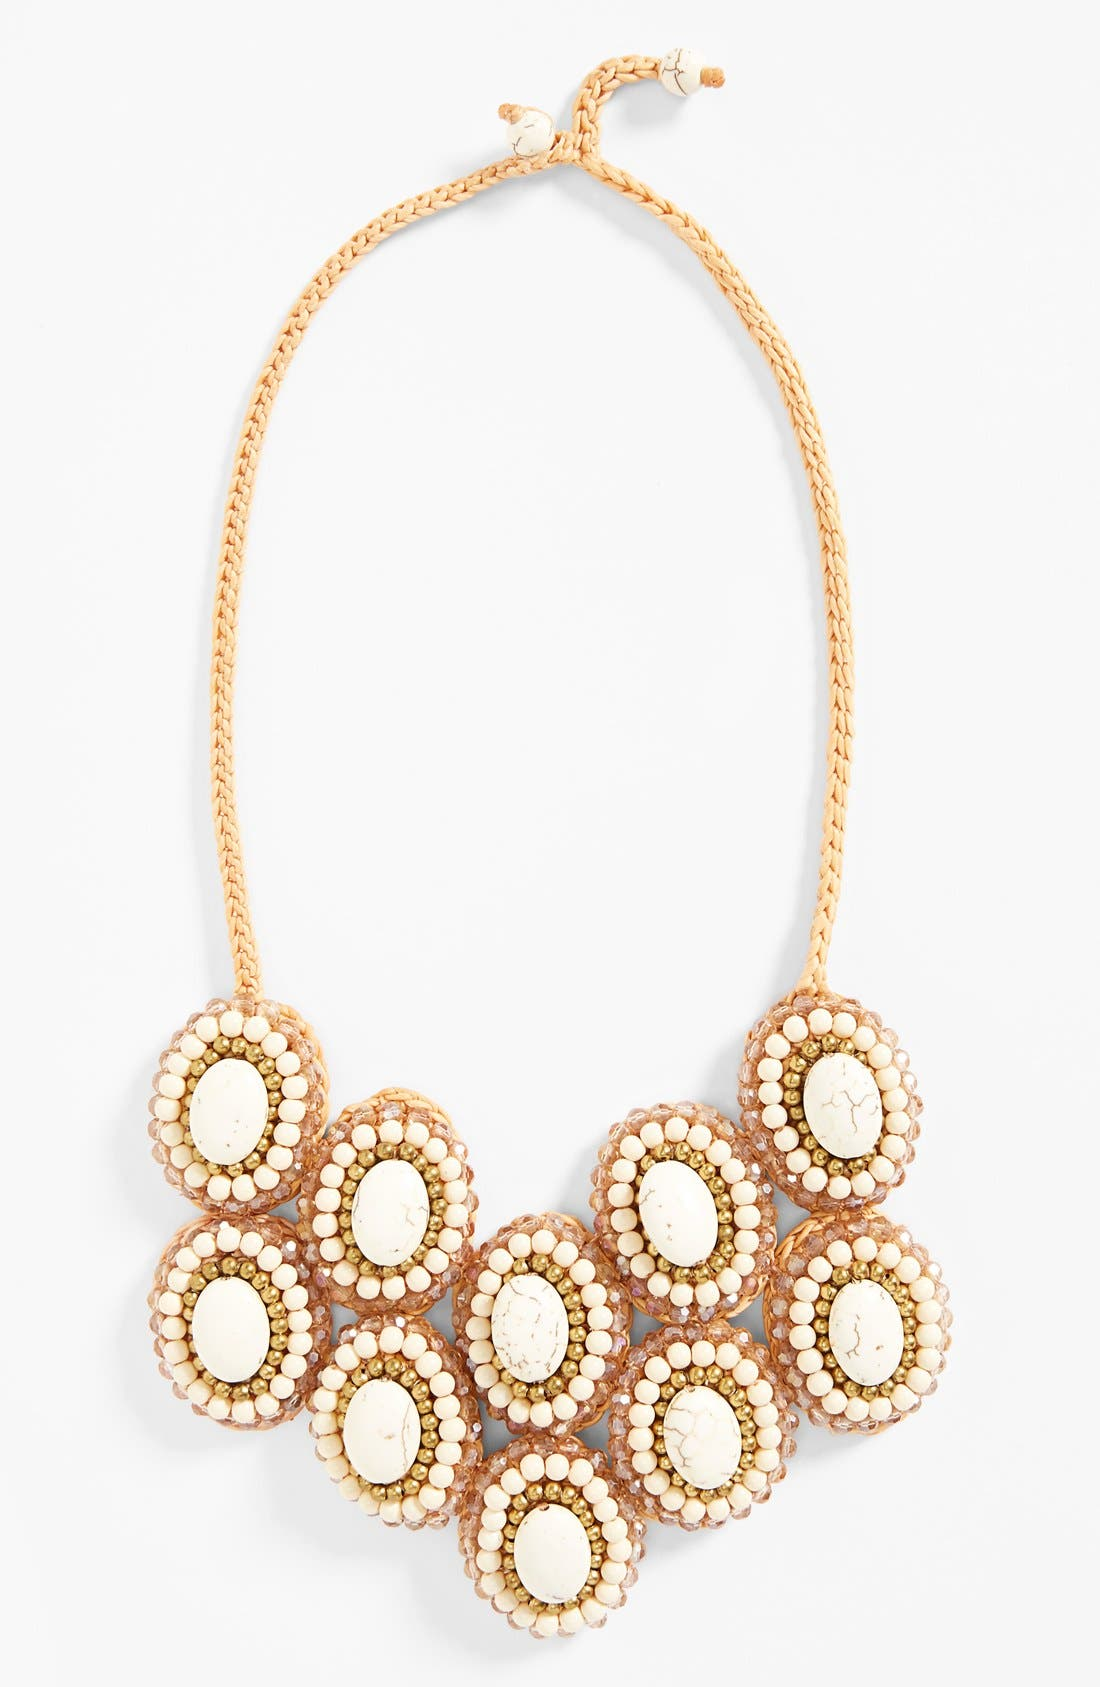 Main Image - Panacea Howlite Bib Necklace